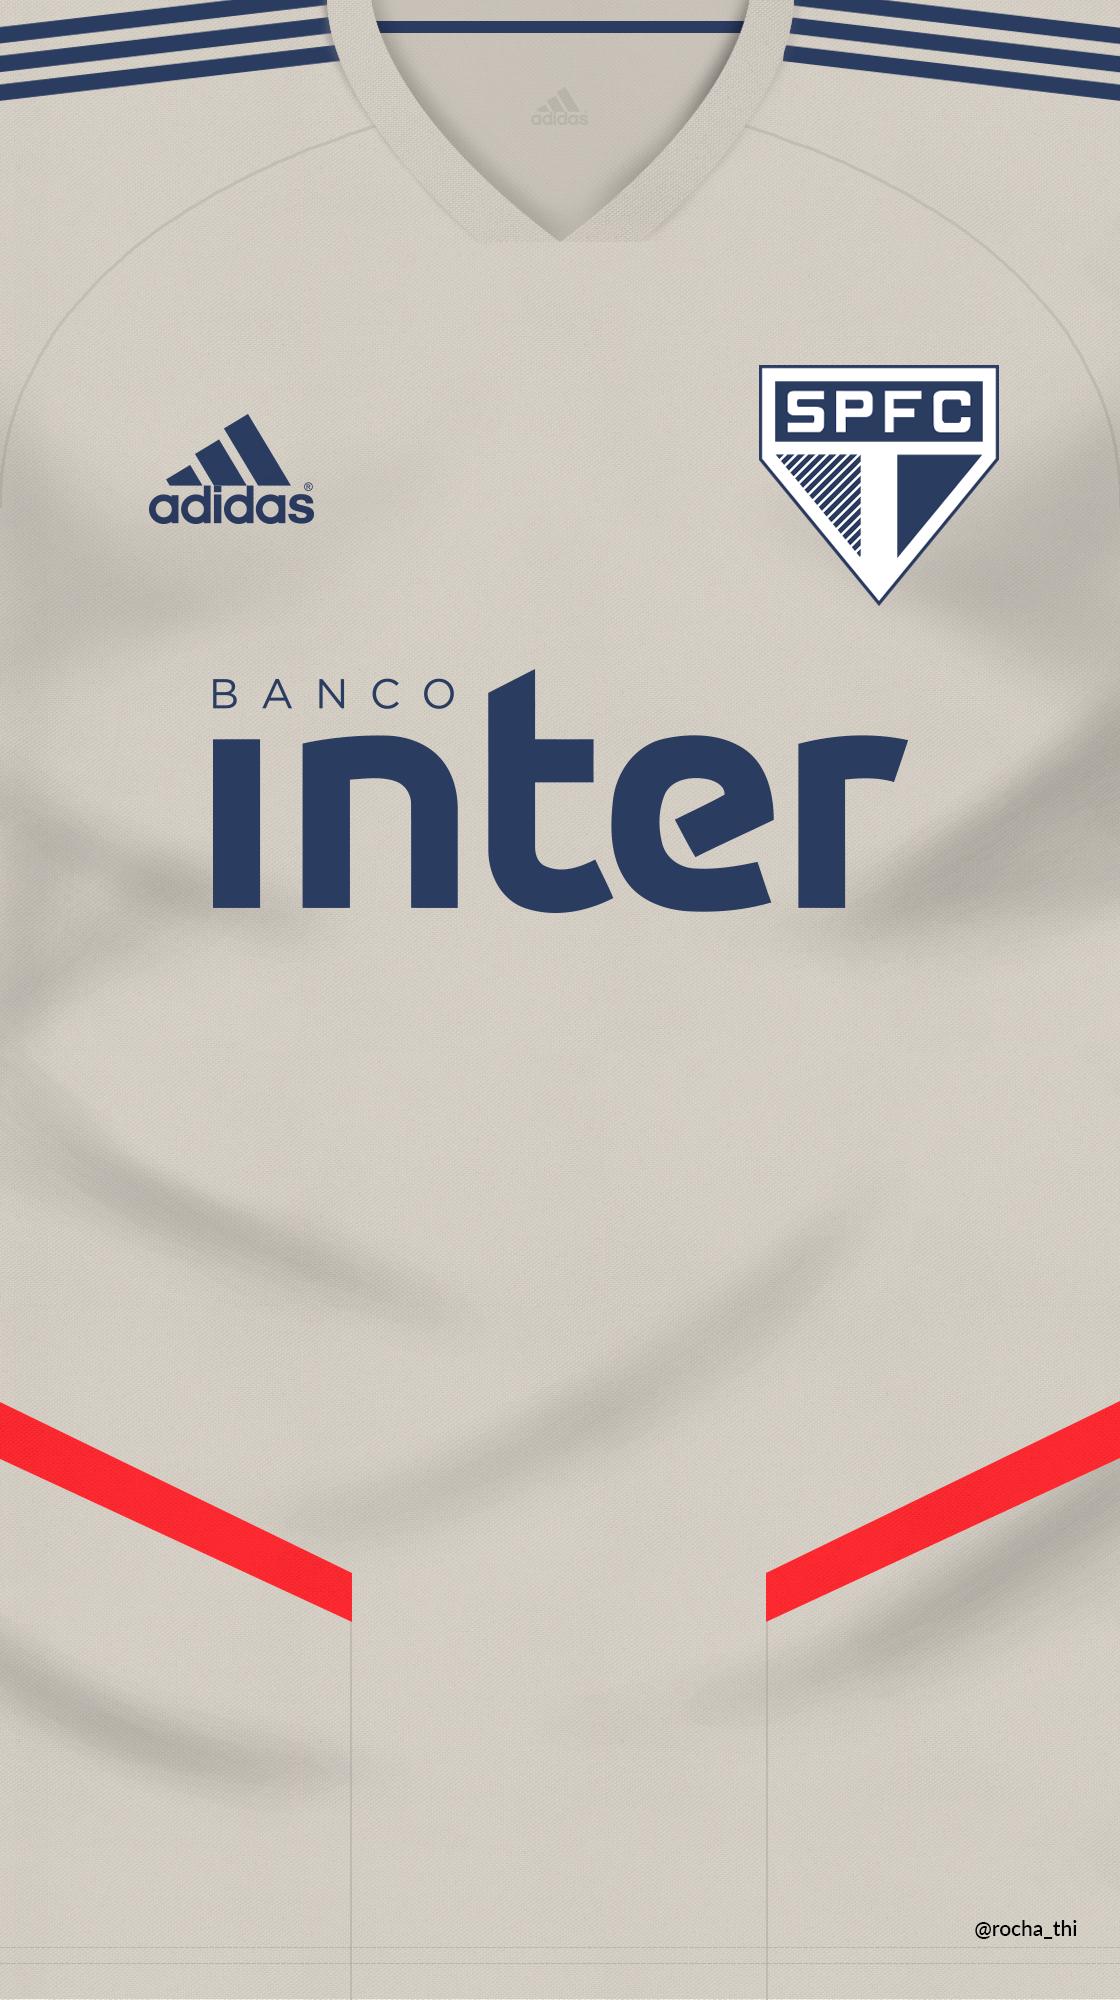 Spfc Saopaulofc Saopaulofutebolclube Tricolor Spfc Sao Paulo Futebol Clube Camisa Spfc